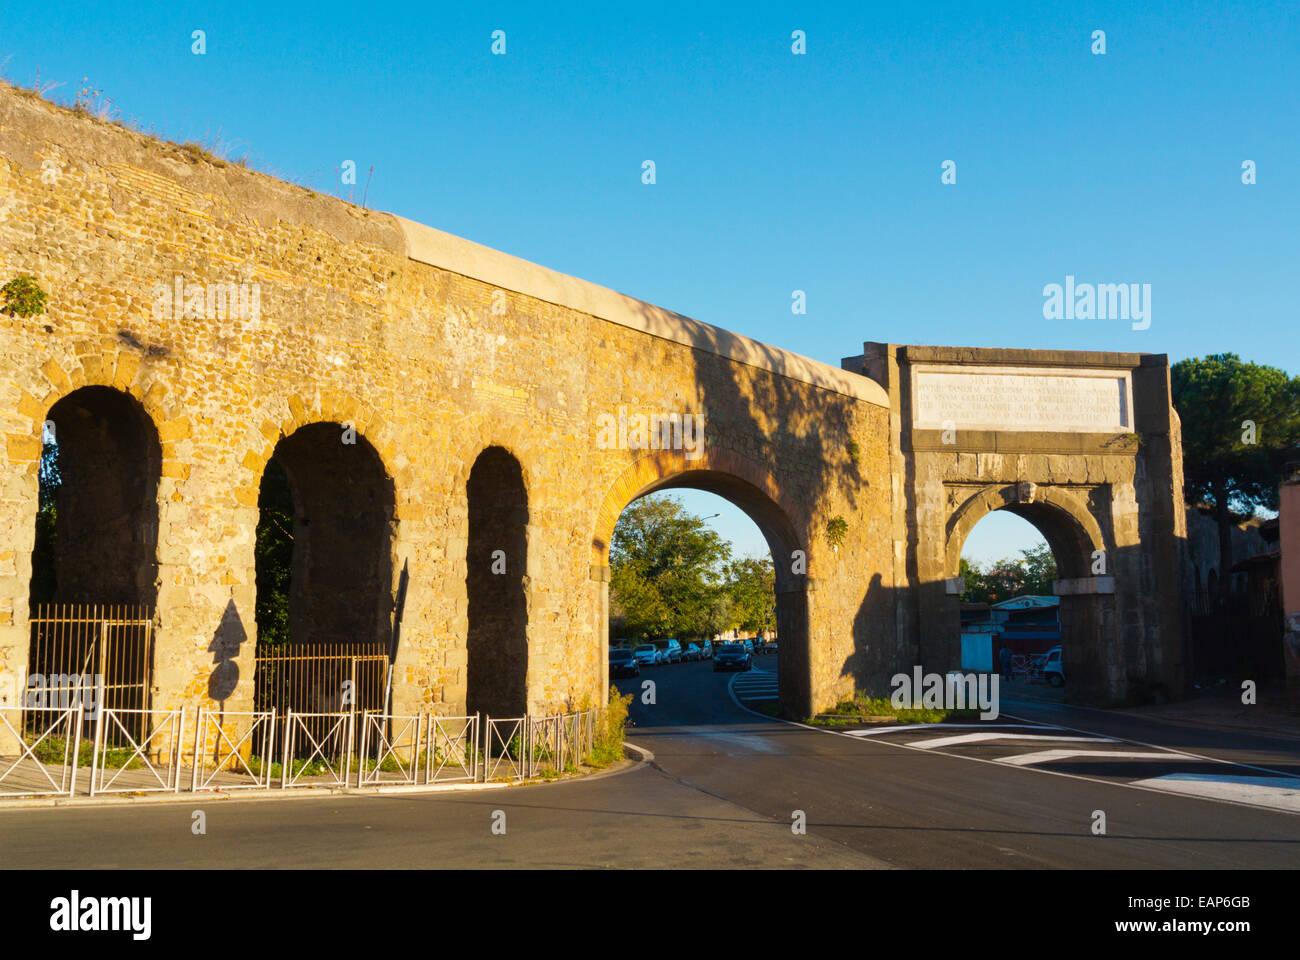 Acqua Felice, Felix or Felice aquaduct, Parco di Torre Fiscale, Rome, Italy - Stock Image